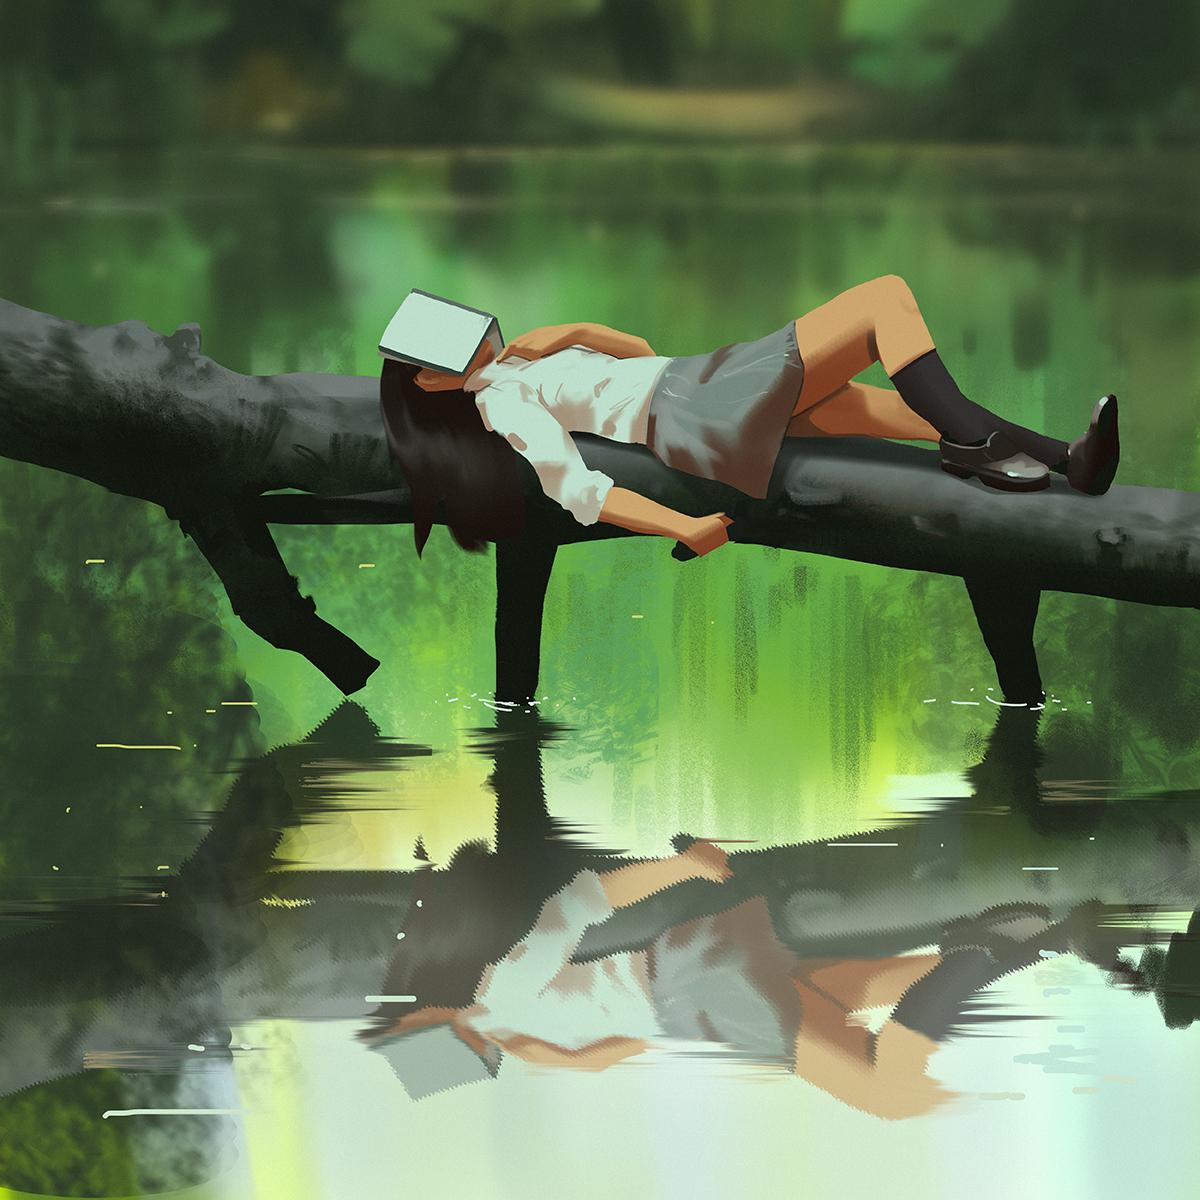 【P站画师】美国画师snatti的插画作品 6